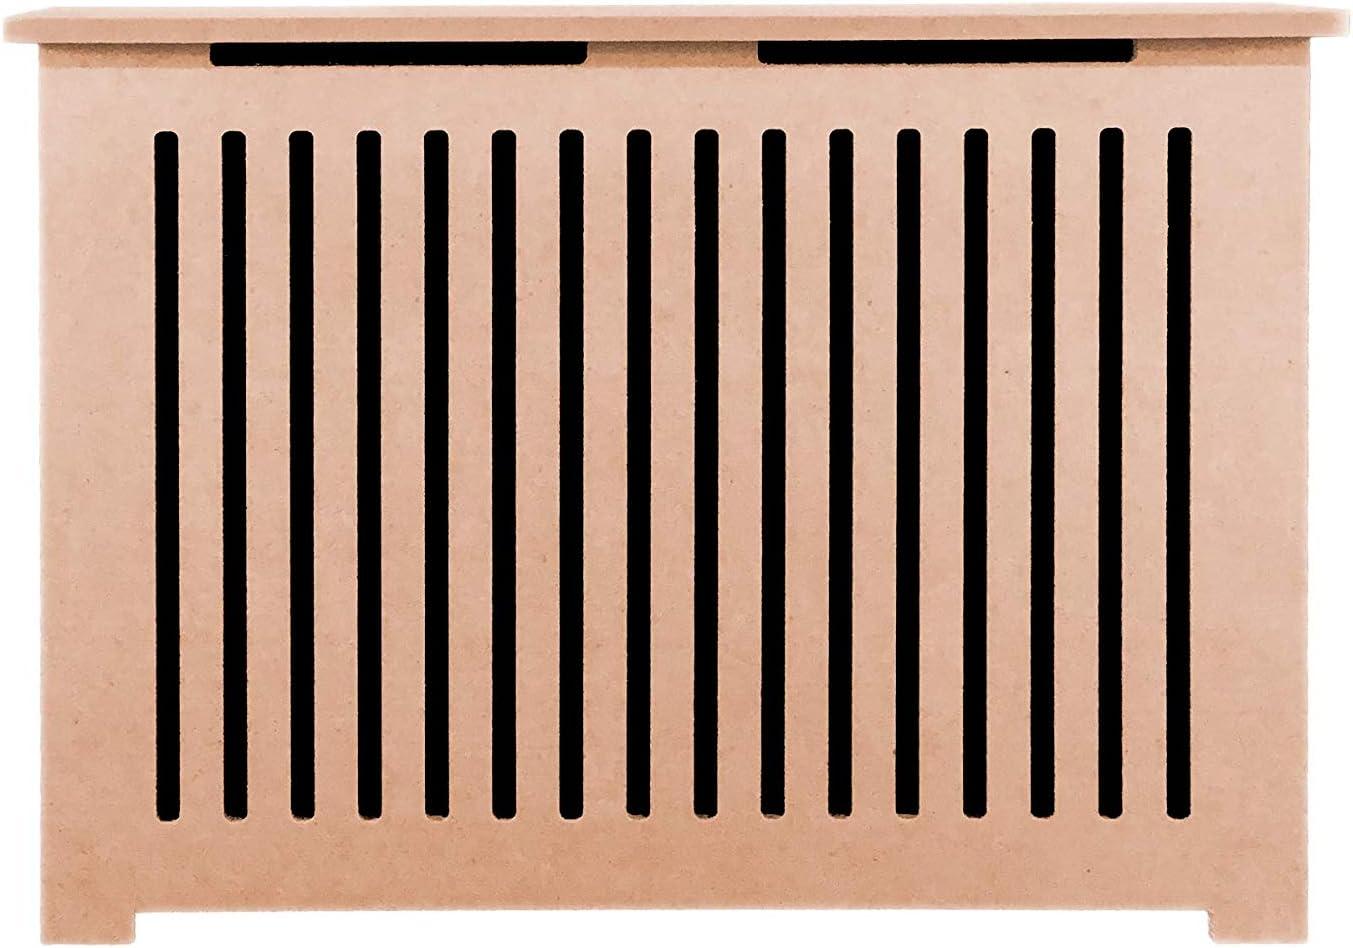 Fichman Furniture Unpainted Radiator Cover Kit, 36